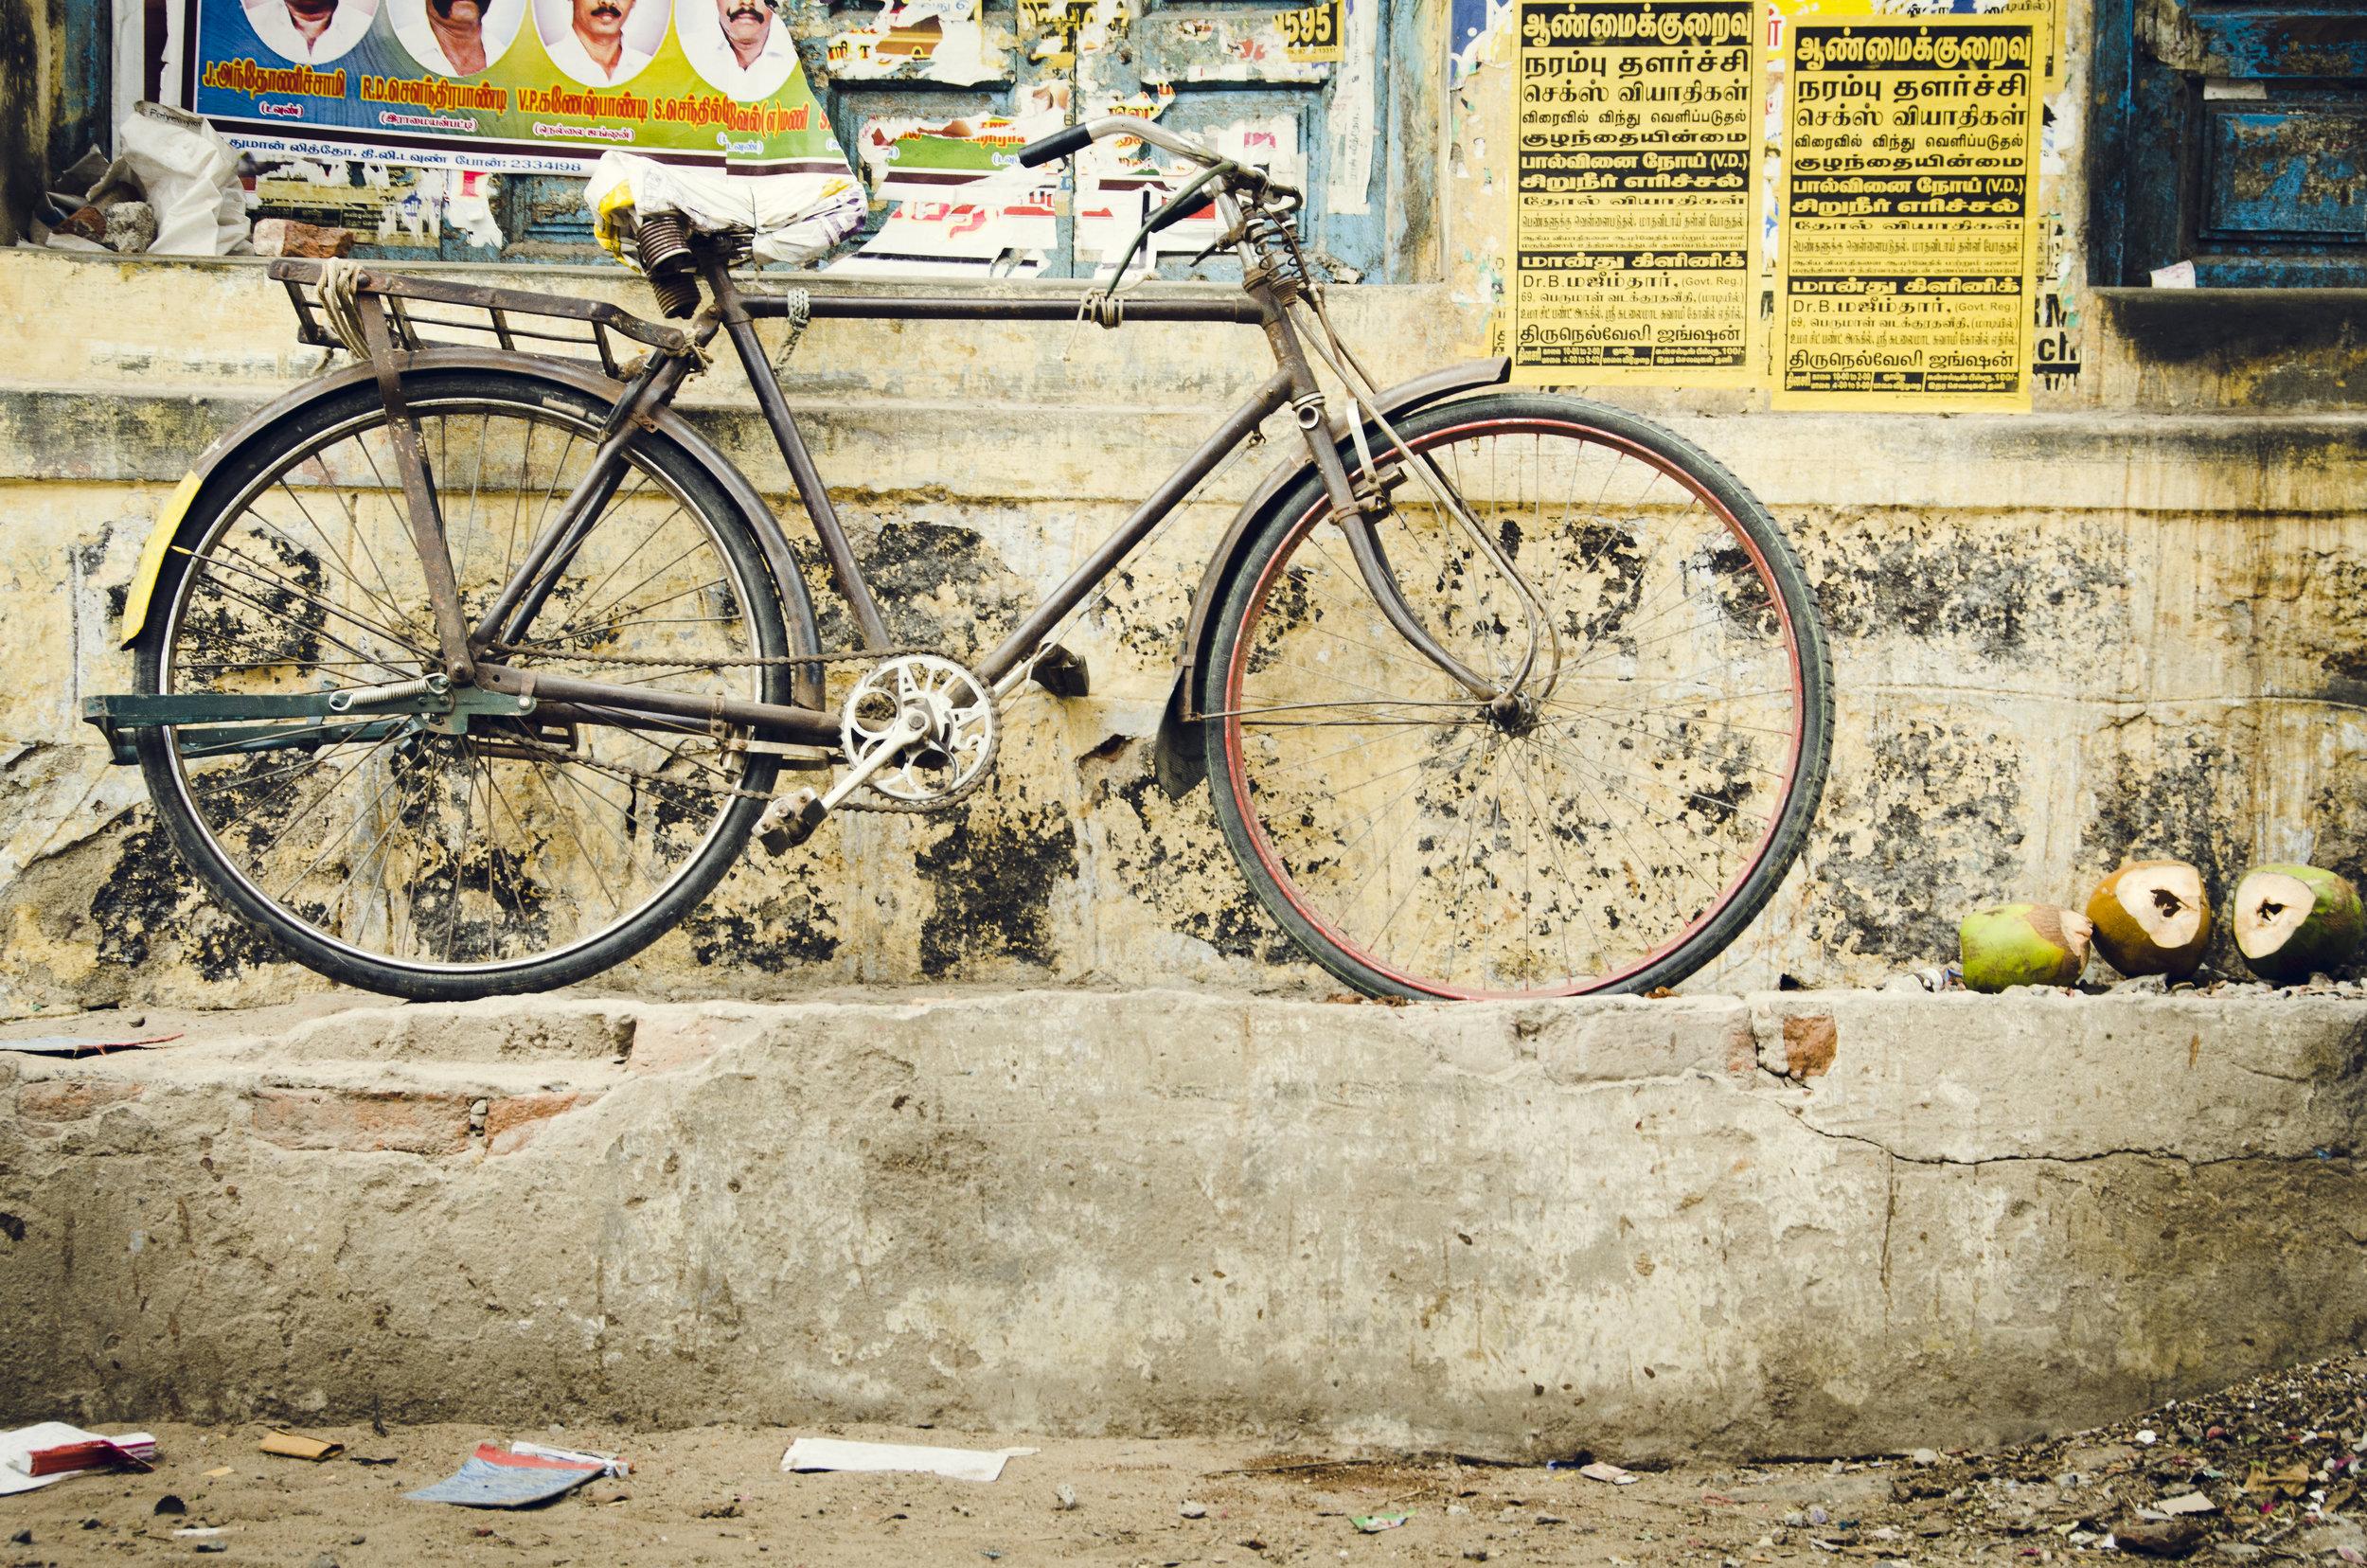 India-499.jpg